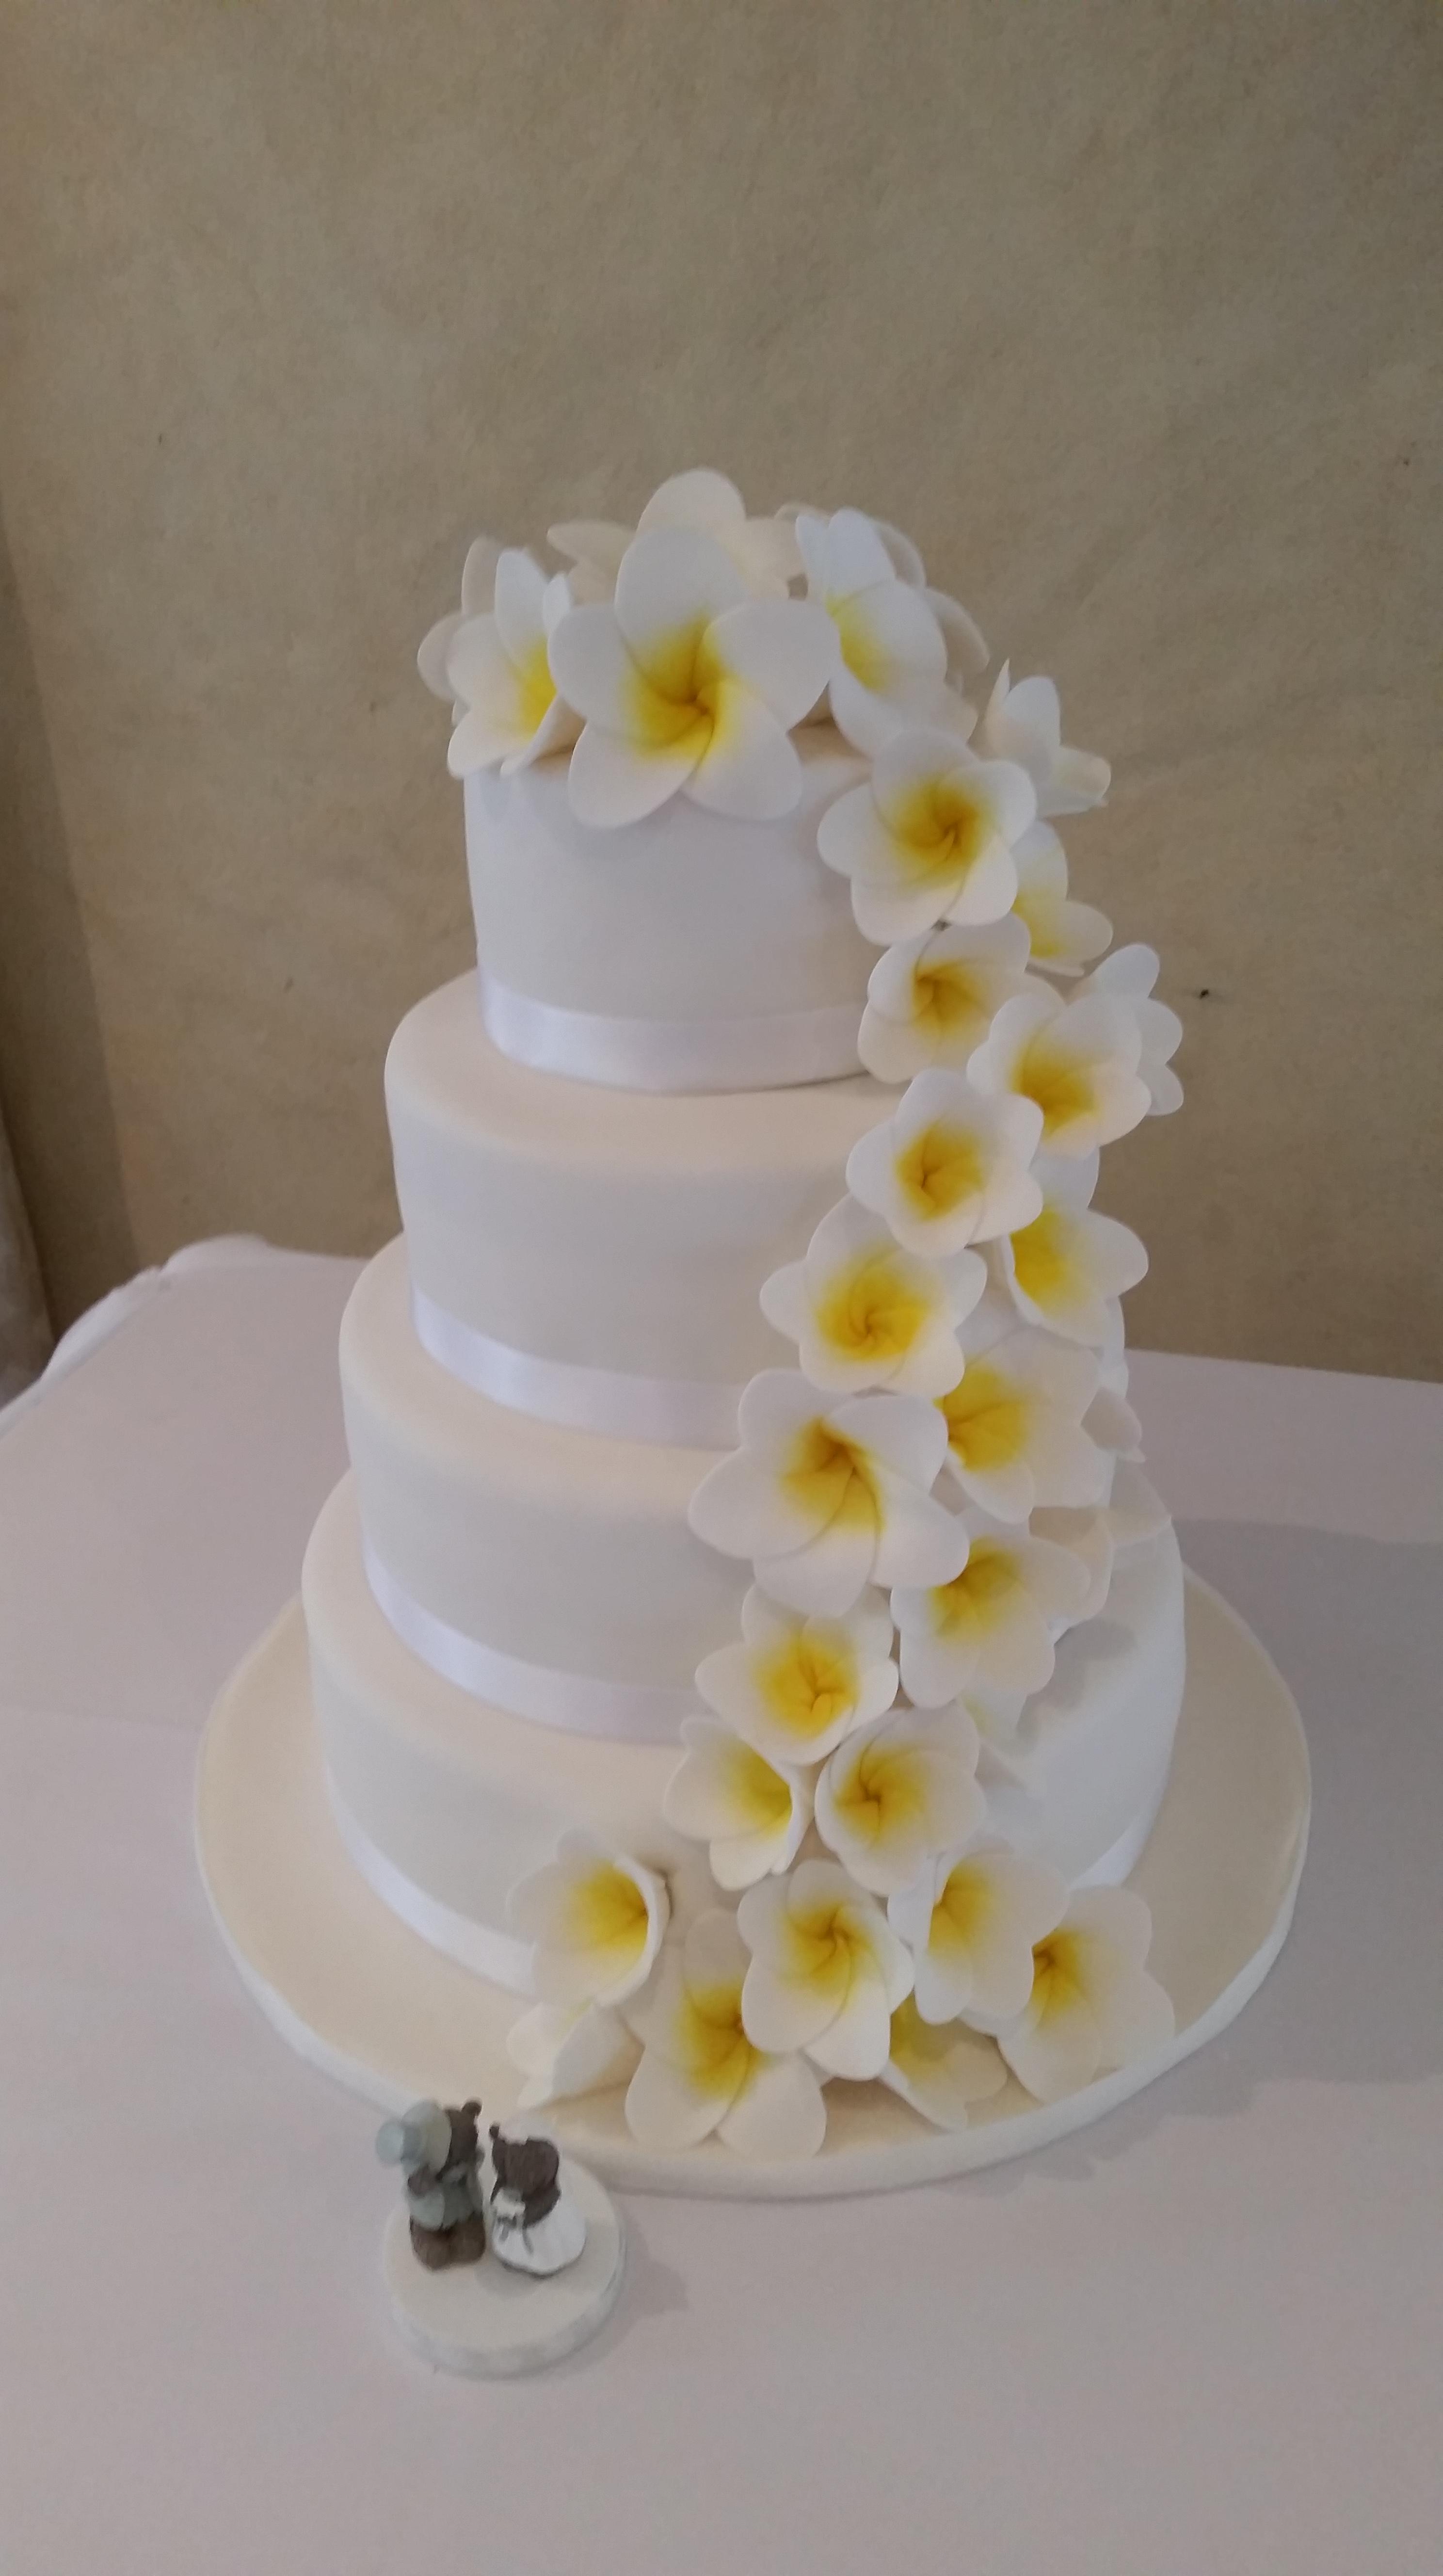 Nikkies Novelty Cakes